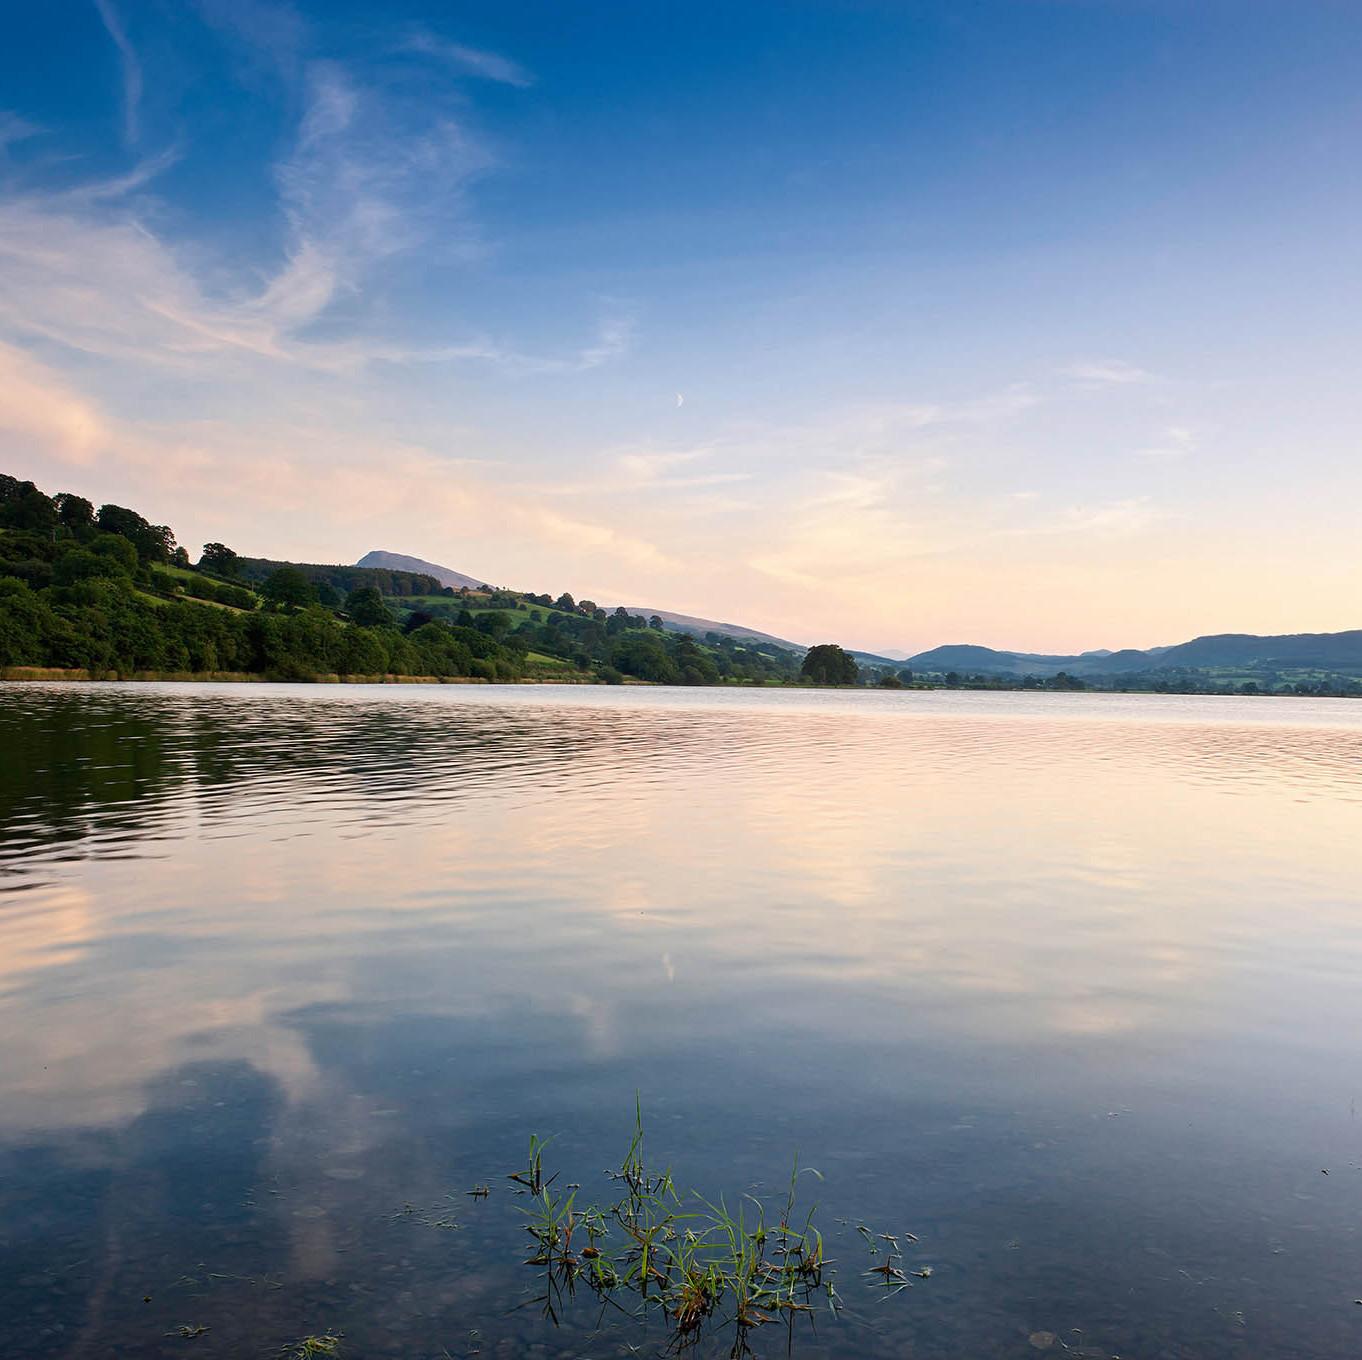 Bala Lake, Llyn Tegid 2